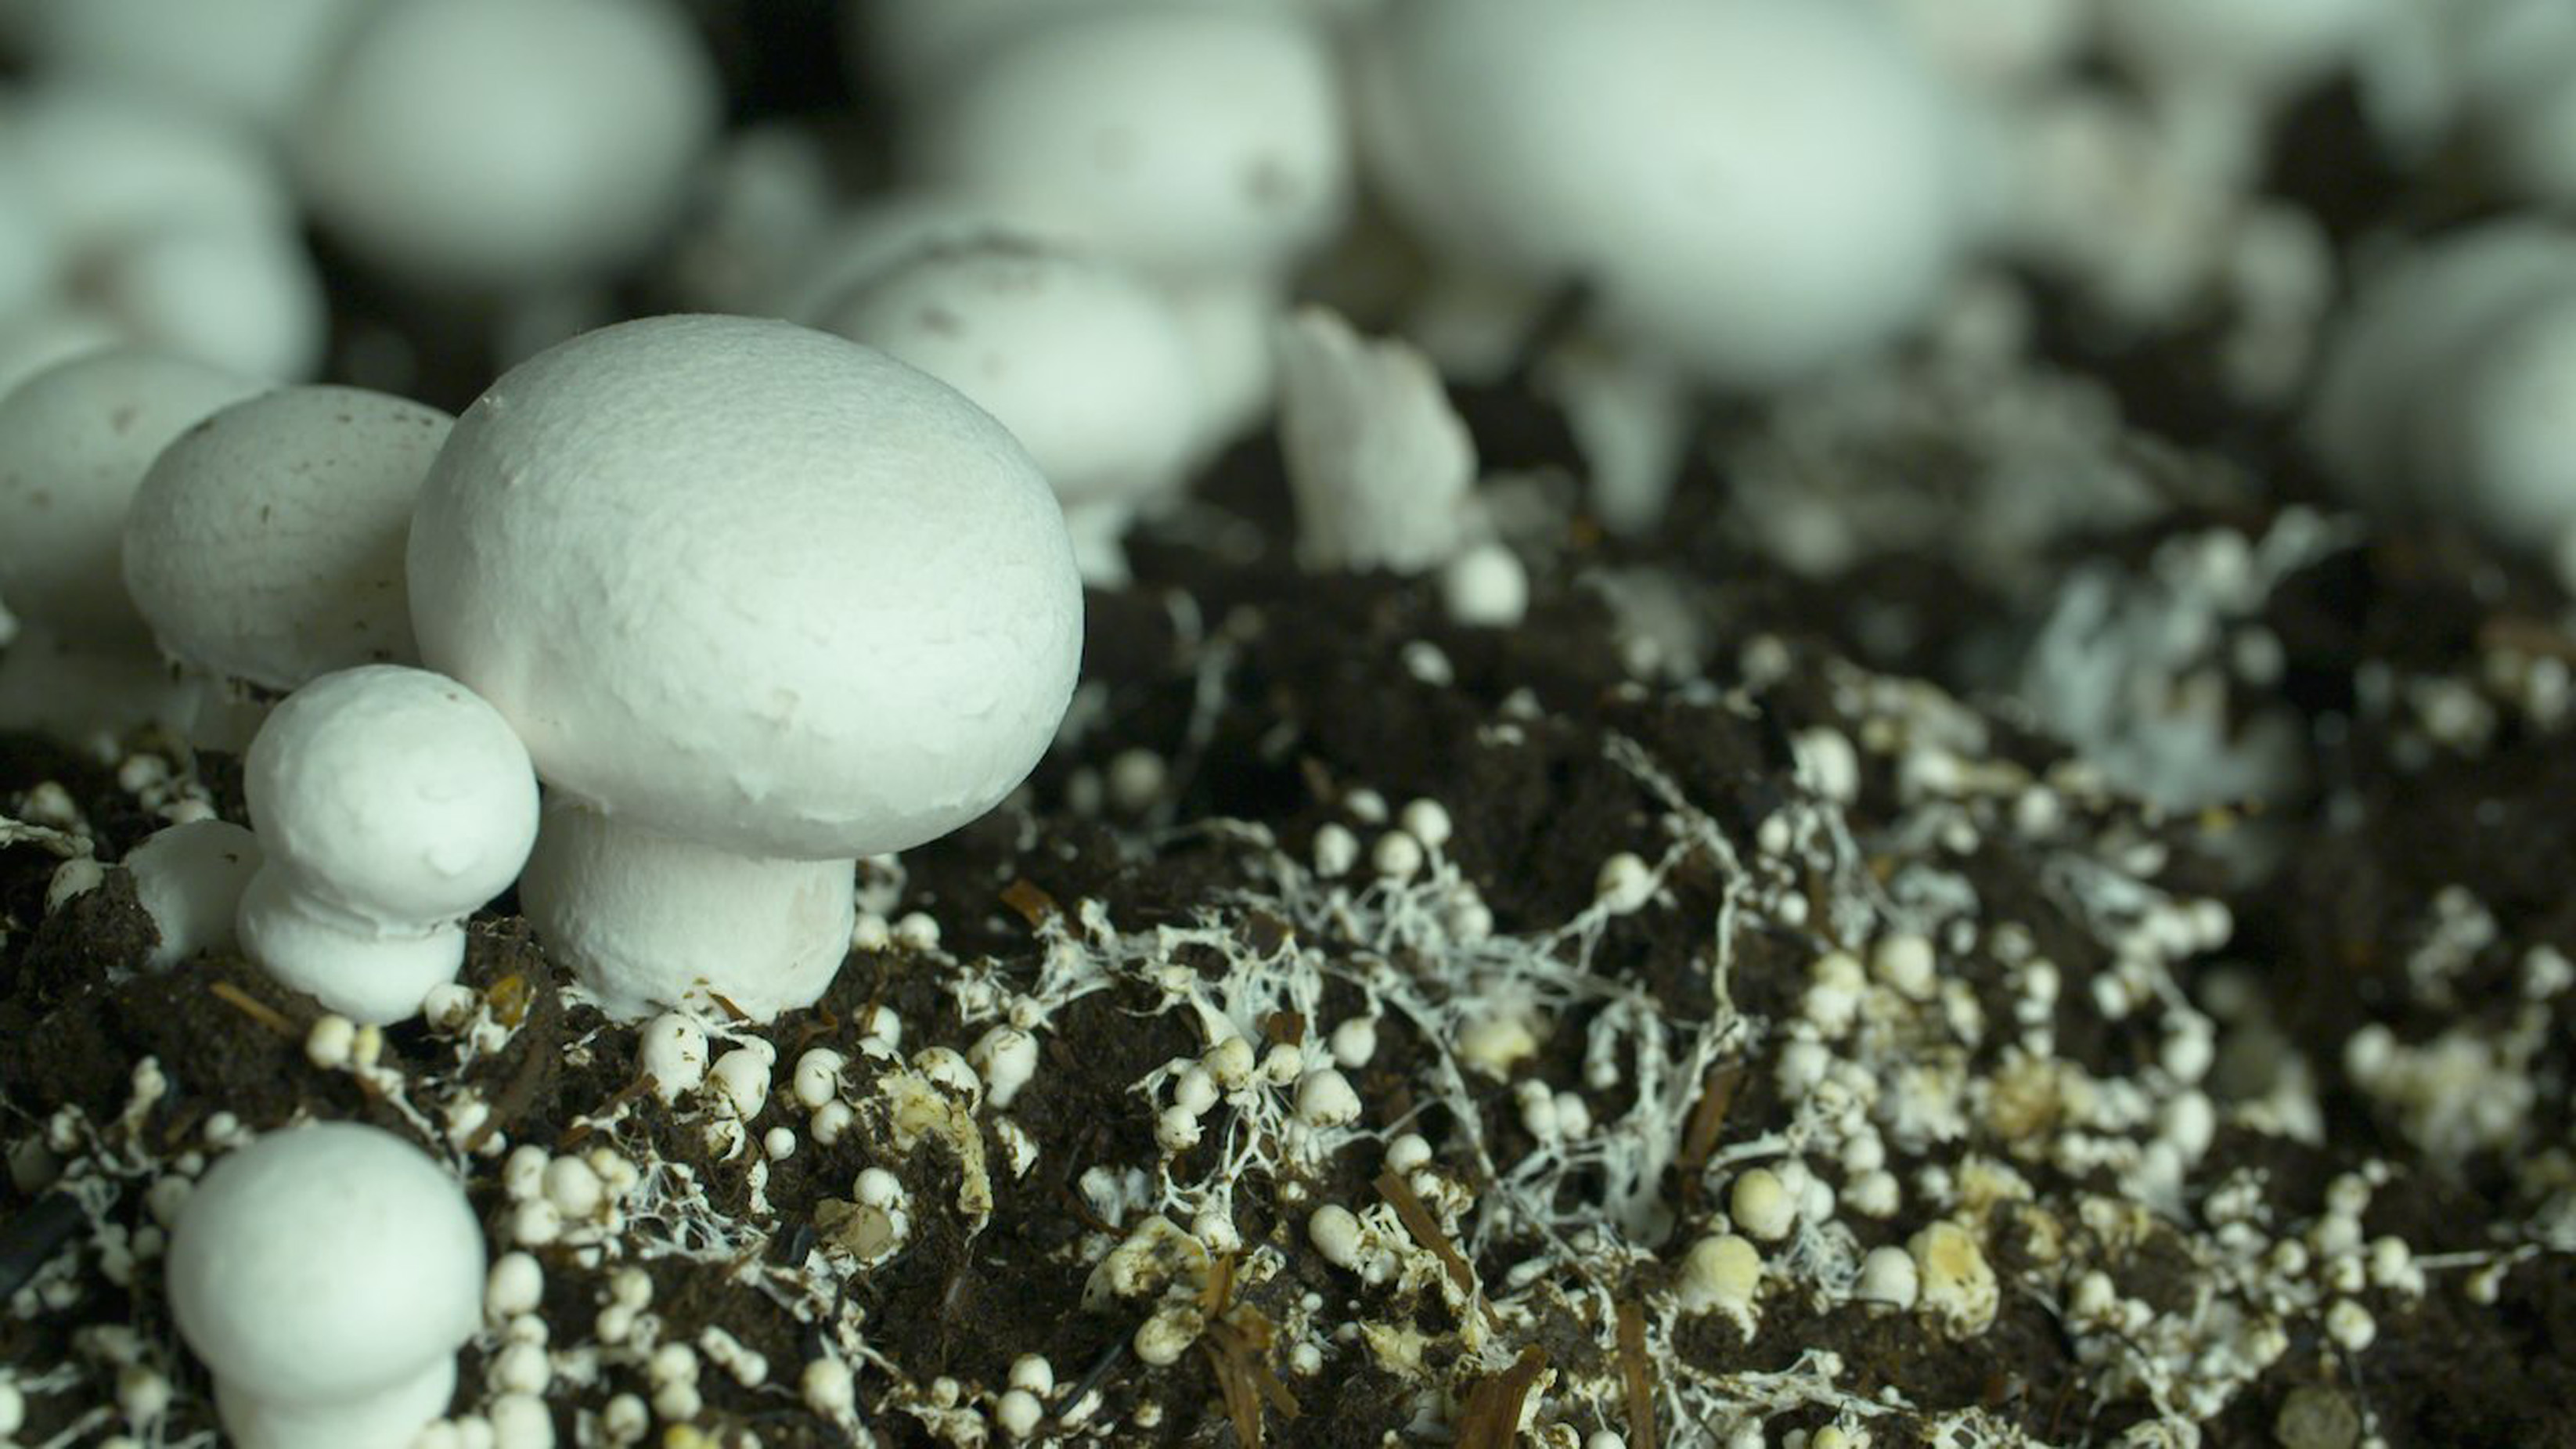 Mushroom-farm worker injured in conveyor accident